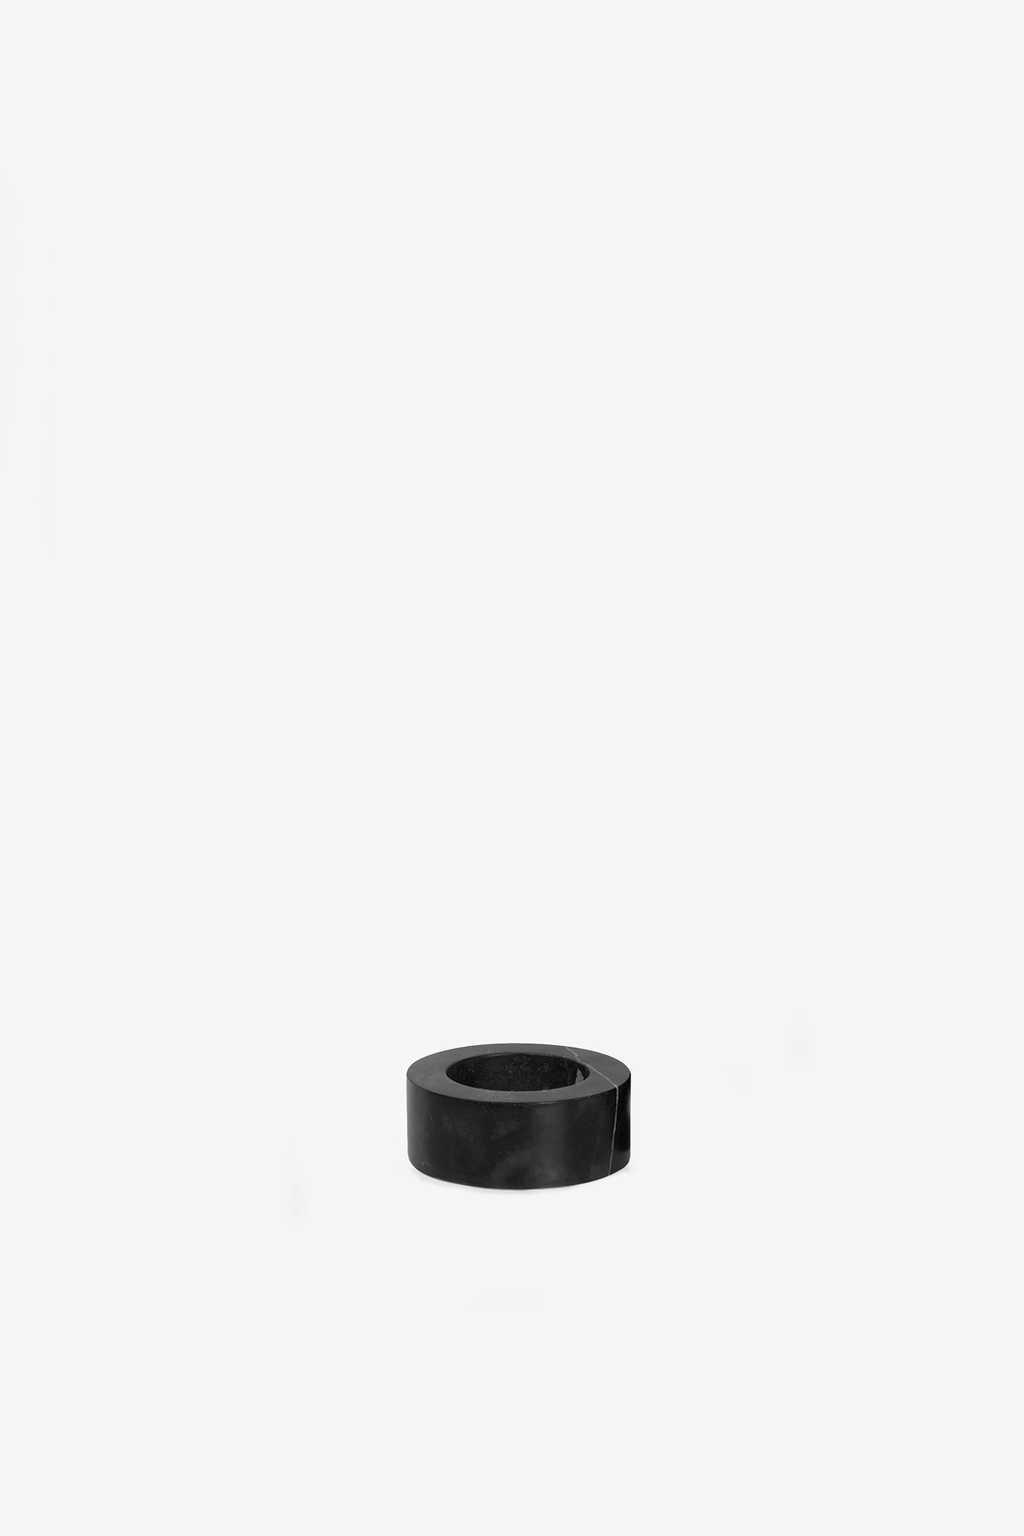 Tealight Candle Holder 1875 Black 2